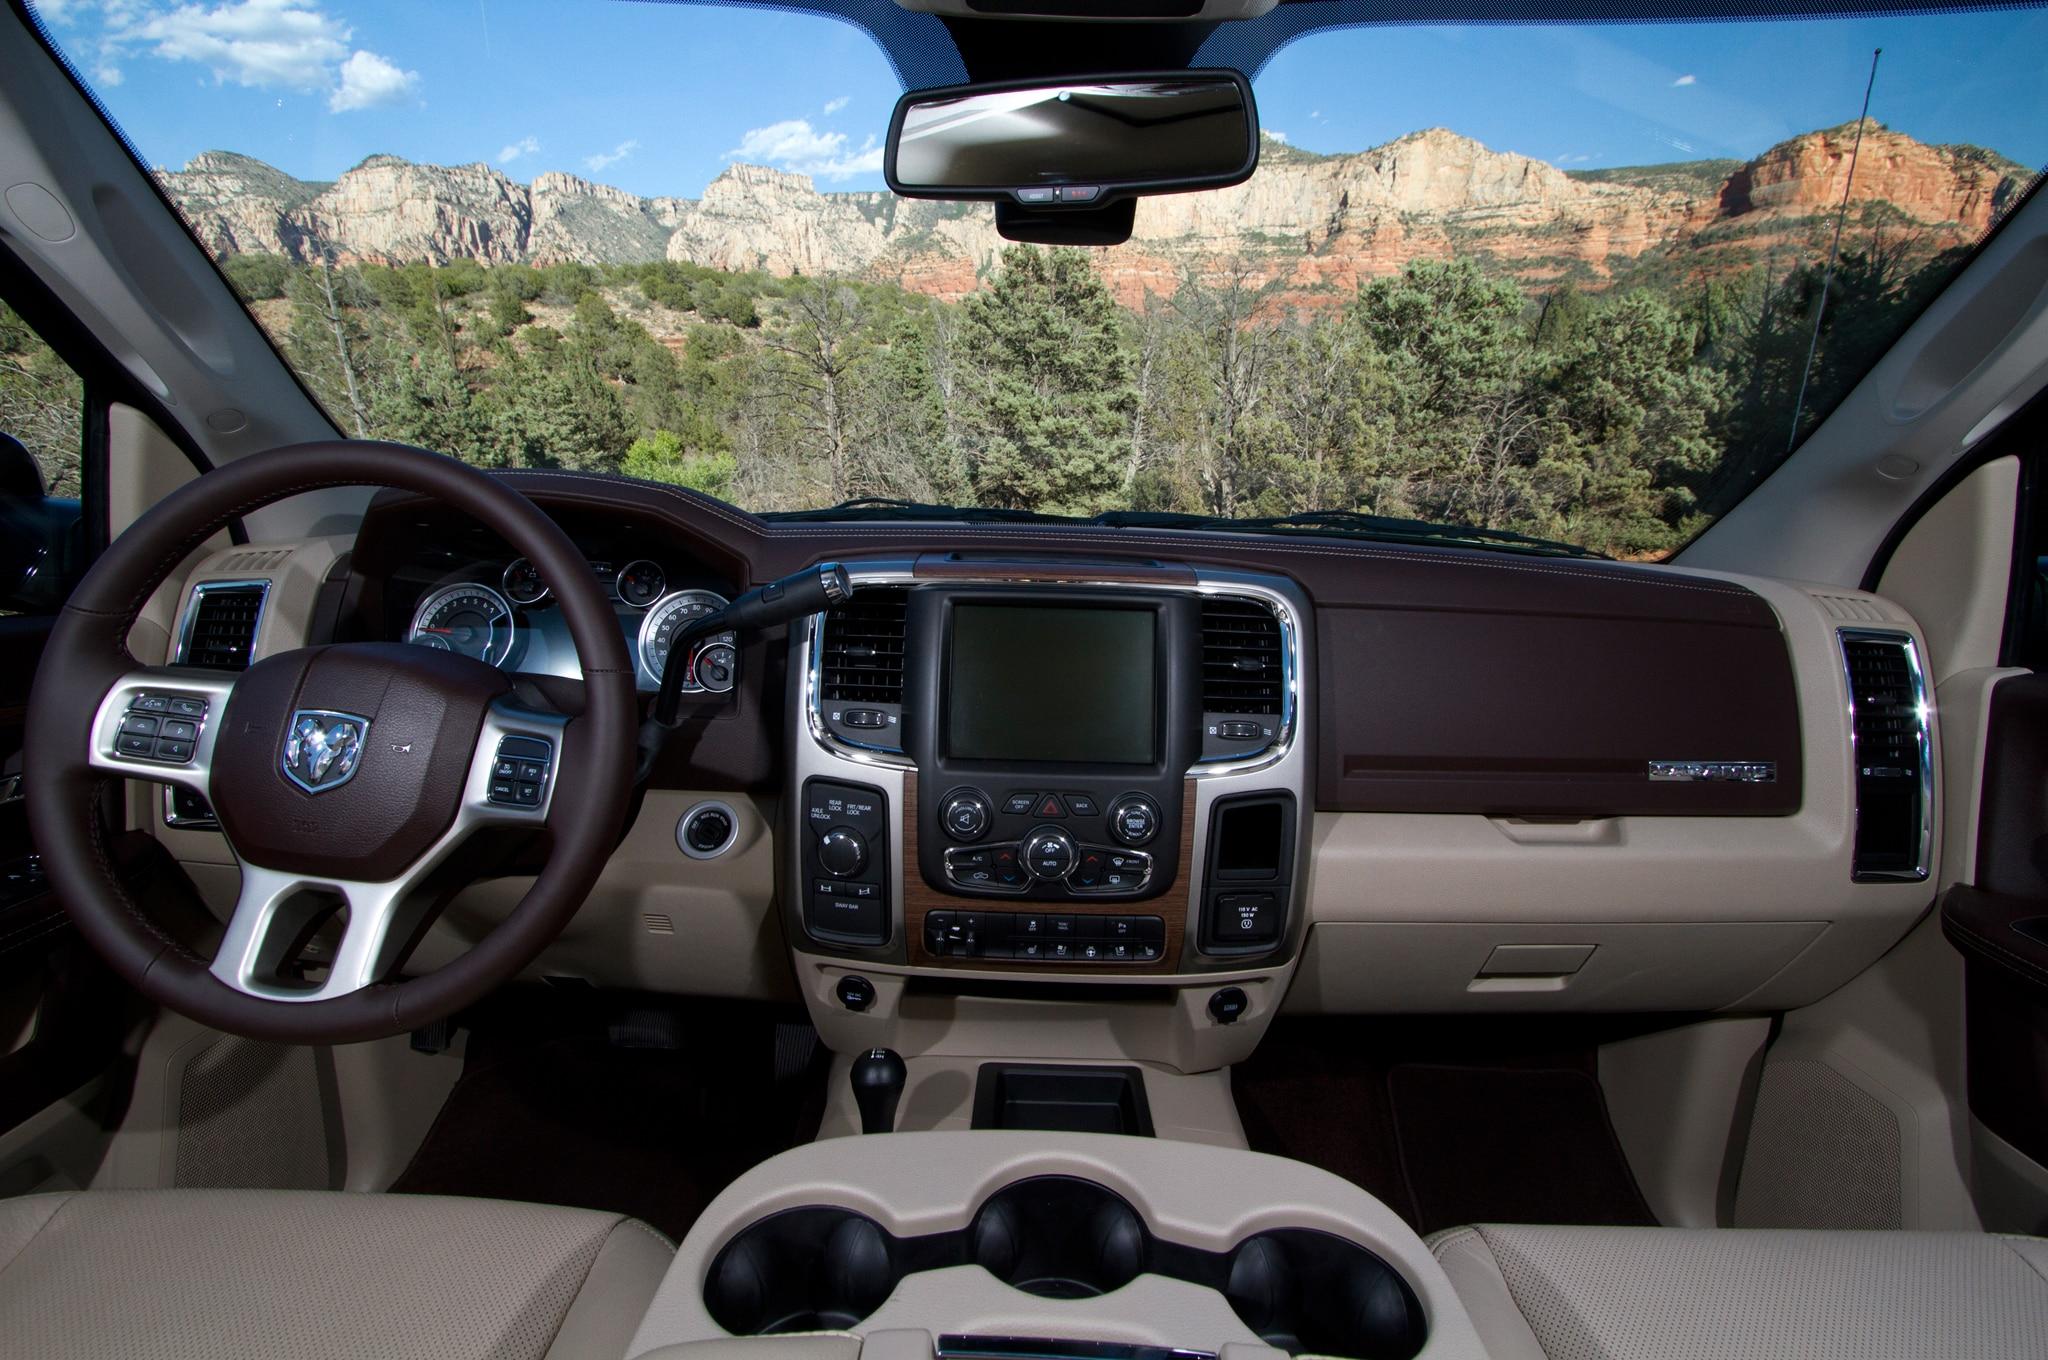 2014 Ram 2500 Power Wagon First Drive